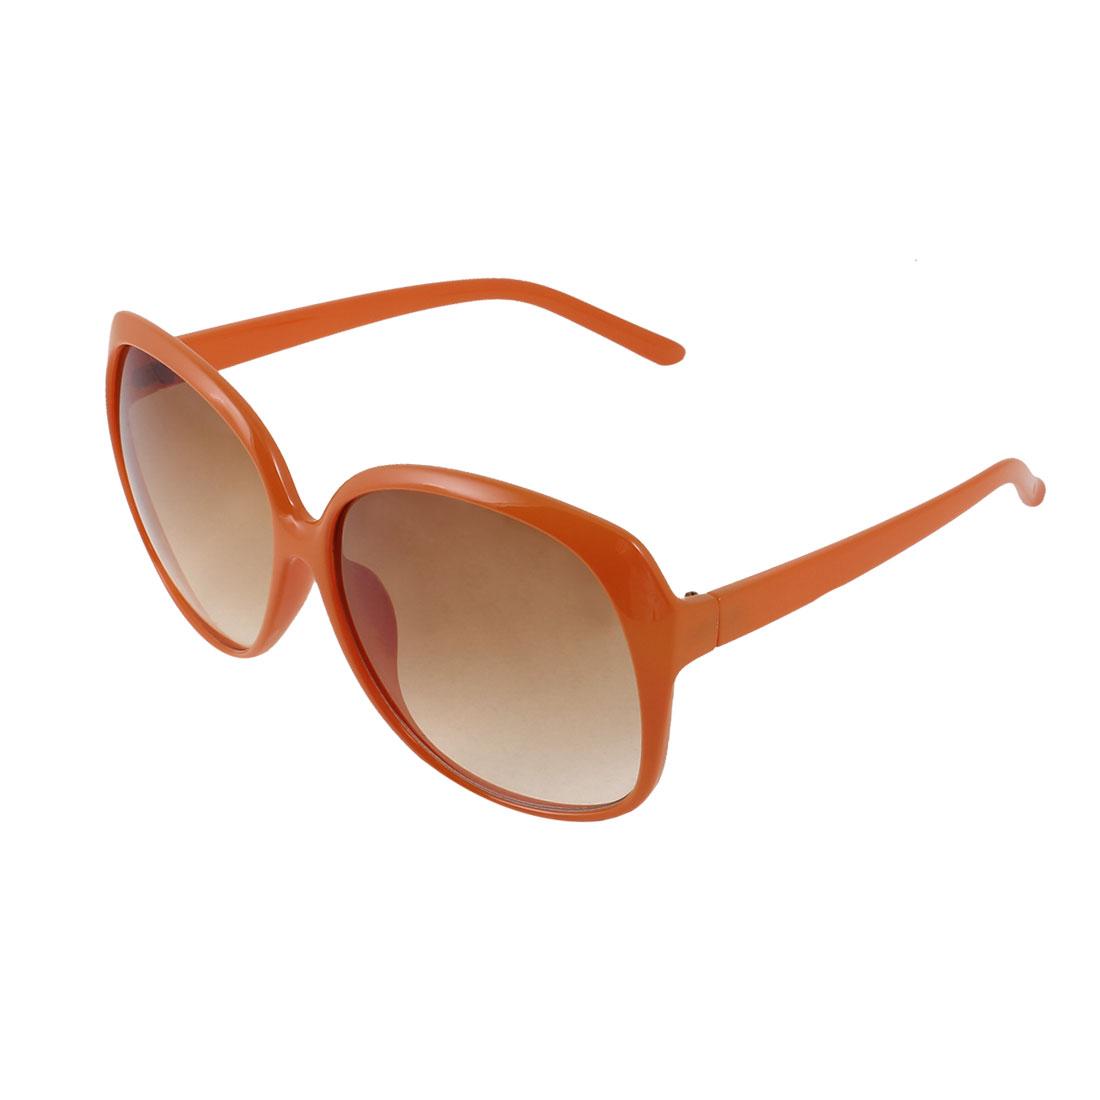 Single Bridge Orange Plastic Full Rim Frame Gradient Brown Lens Outdoor Leisure Sunglasses Eyeglasses for Lady